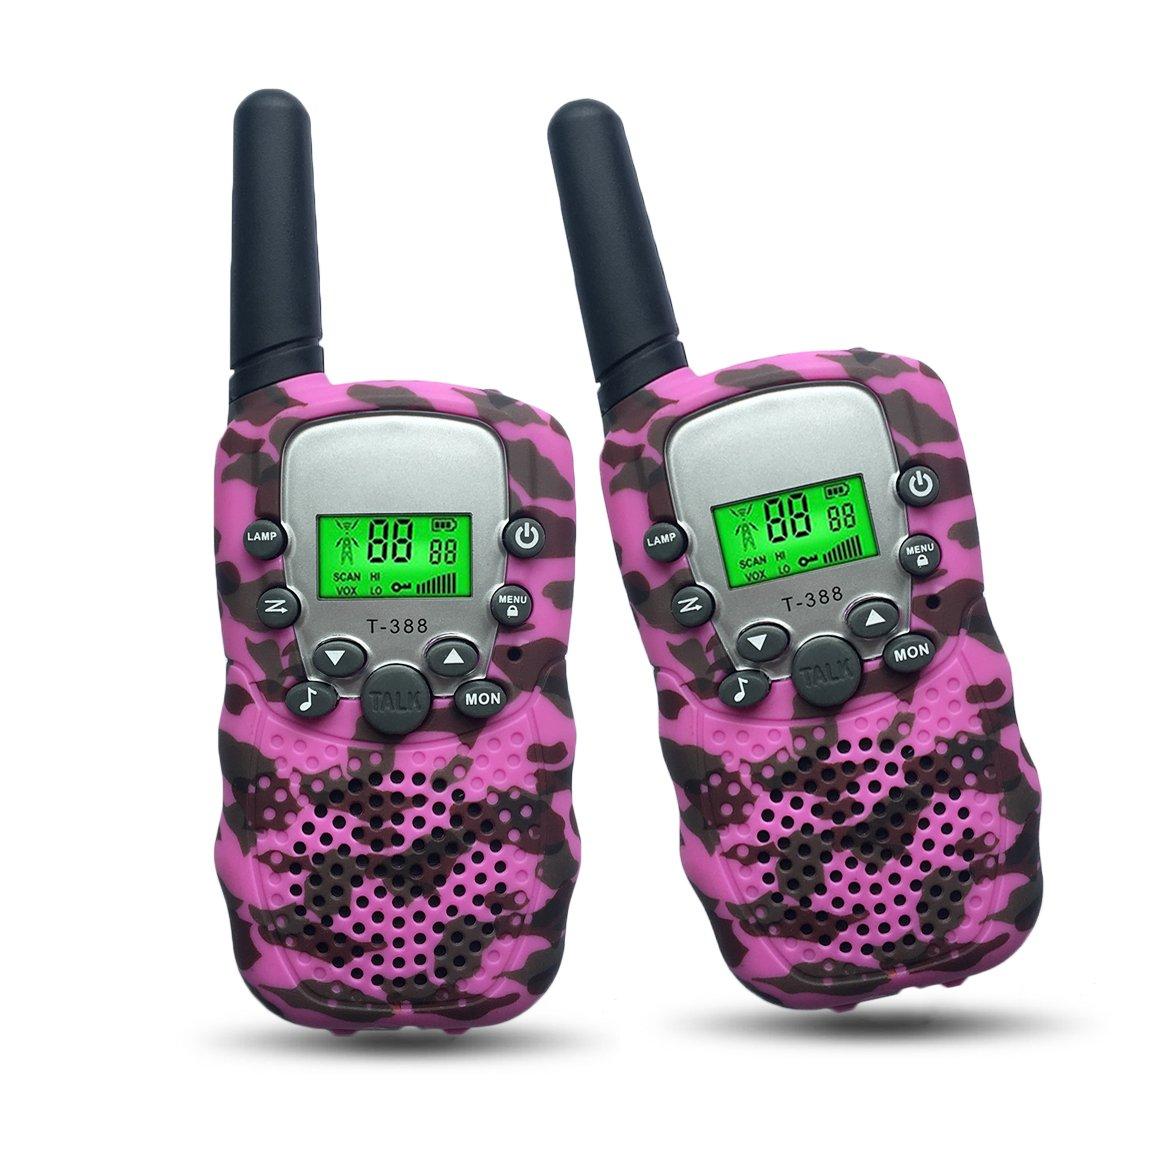 Joyfun Gifts for 4-8 Year Old Girls Walkie Talkies for Kids Pink Camo Long Distance Kids Outdoor Recreation Girl Toys Pink - 1 Pair